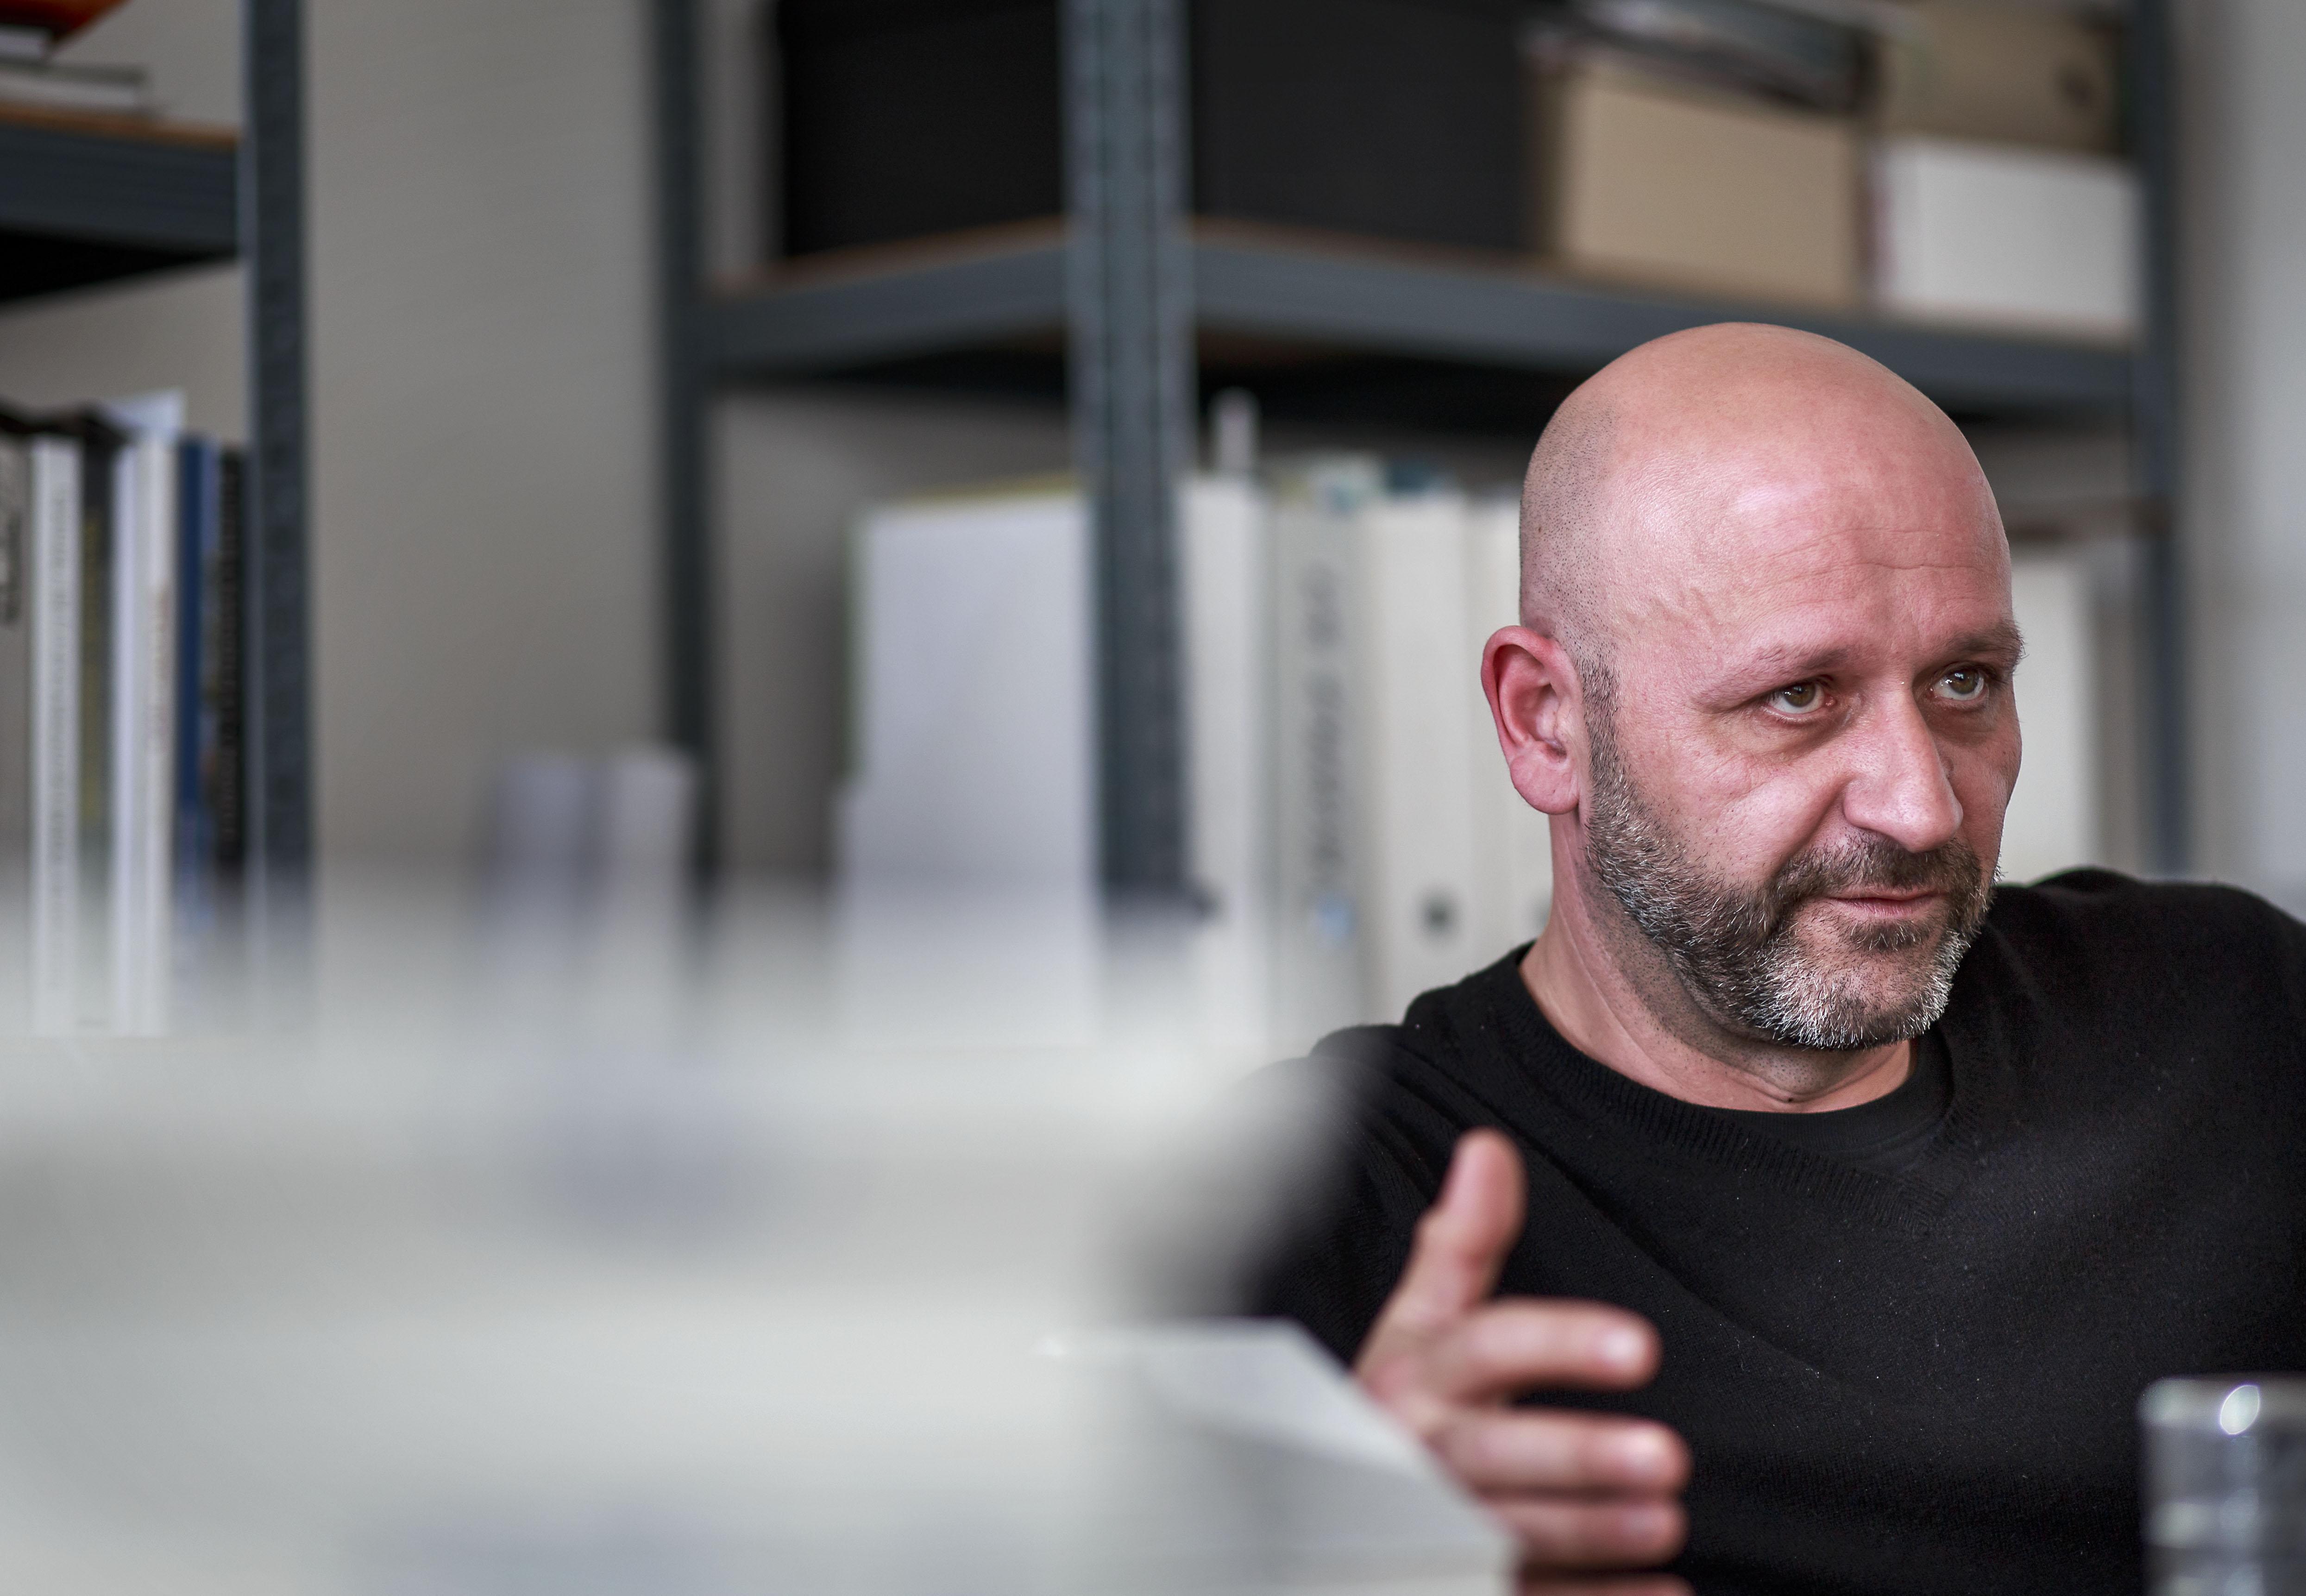 Prešov 21.4. 2015. Architekt Irakli Eristavi. Foto N - Tomáš Benedikovič